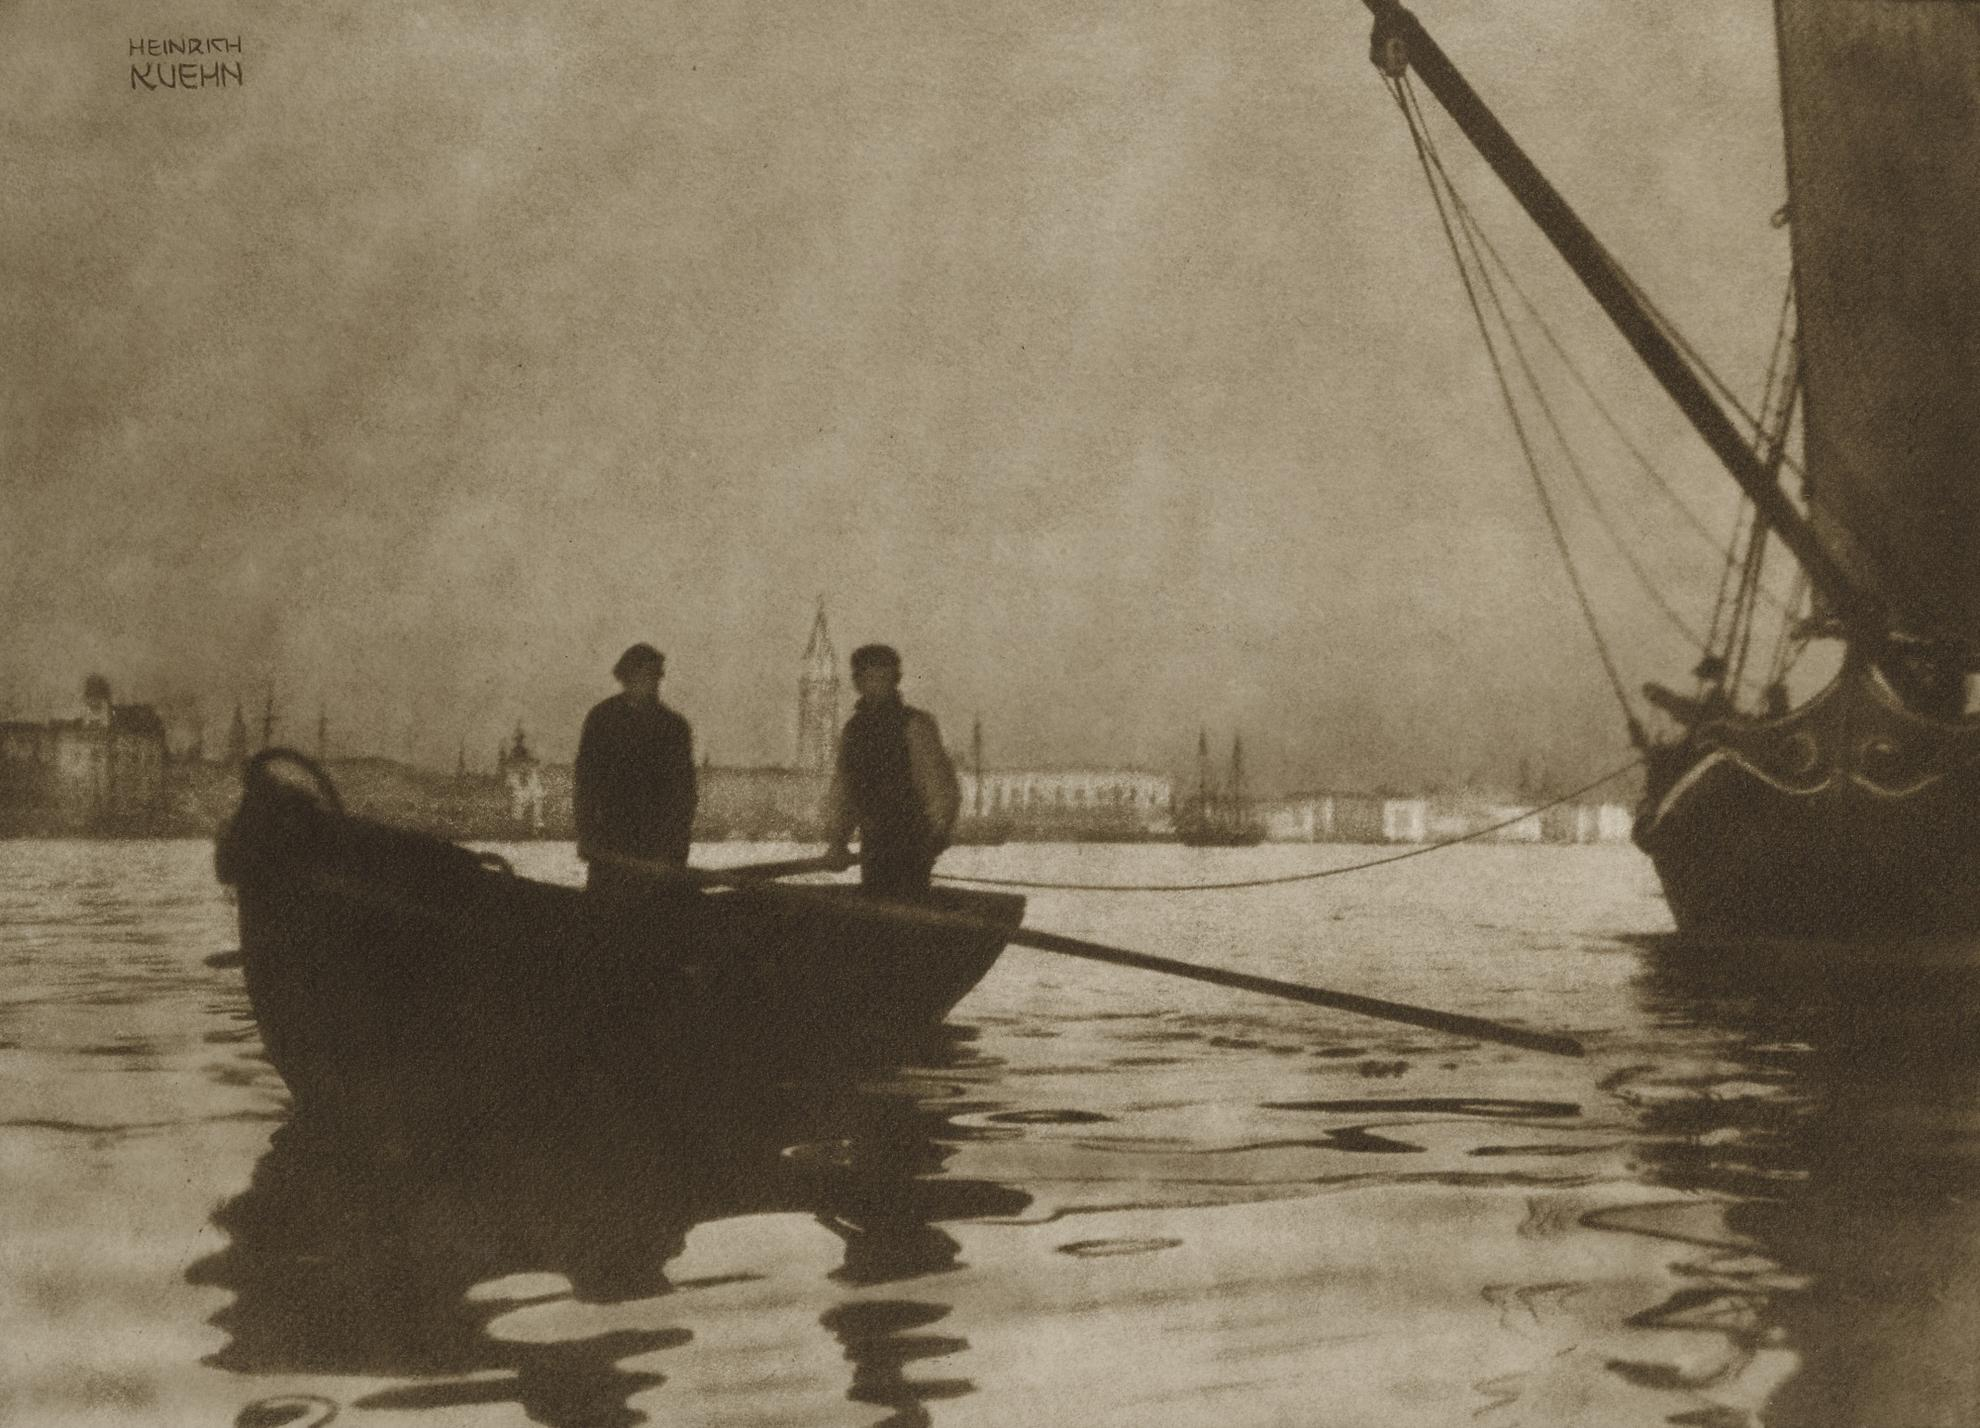 Heinrich Kuhn-In Bacino Di San Marco, Venezia-1898